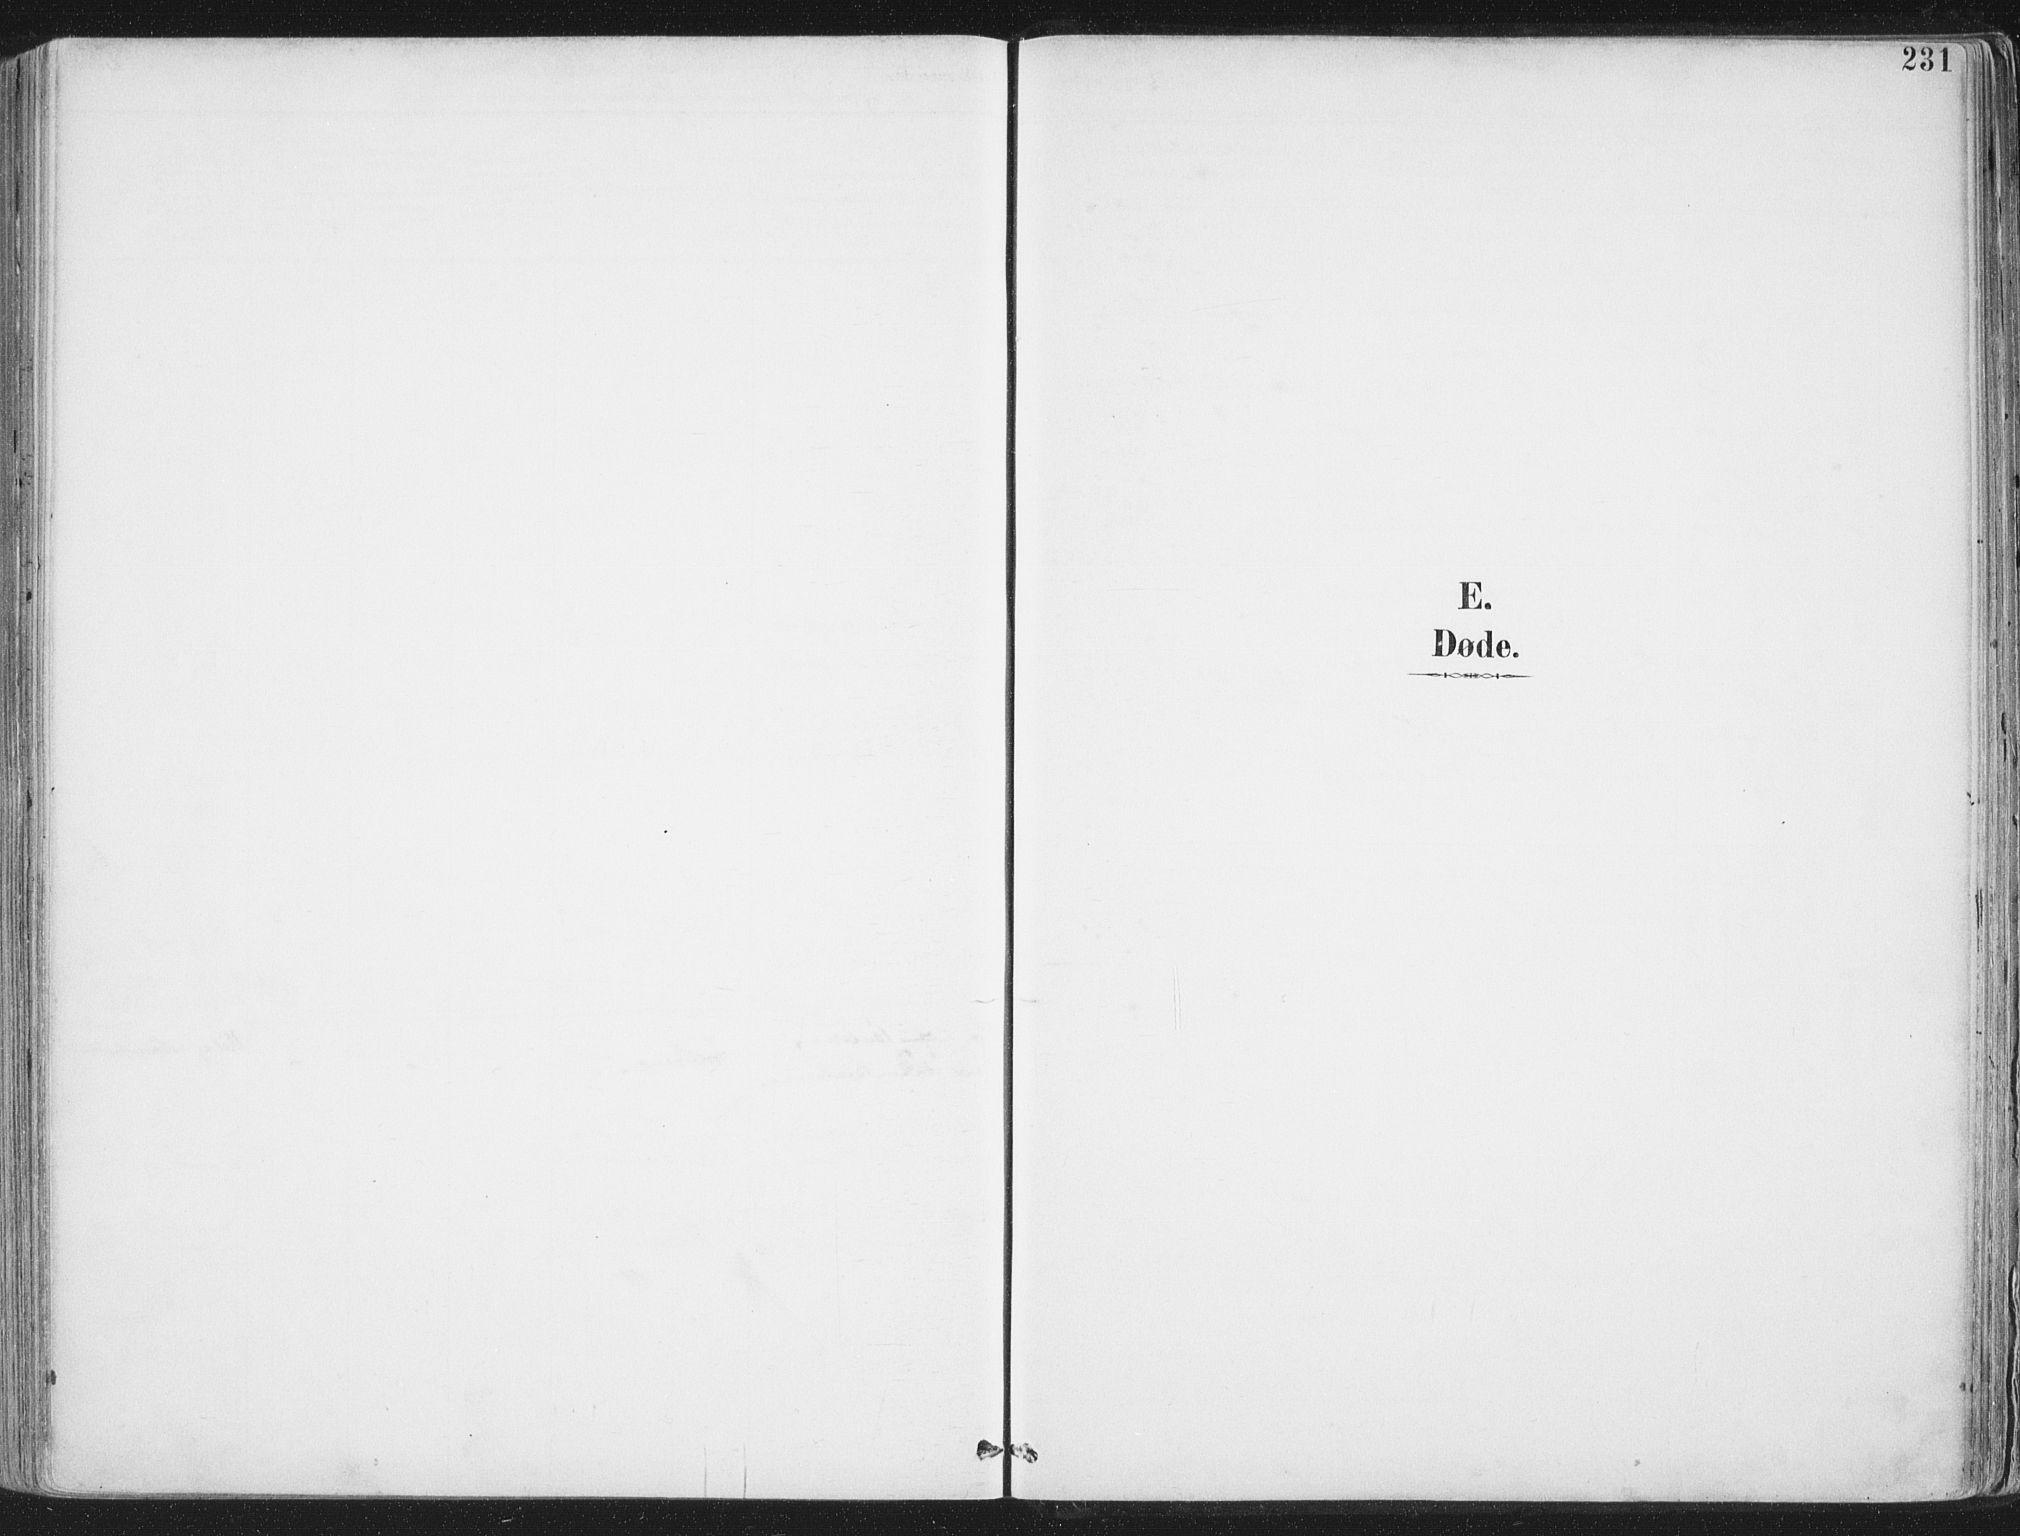 SAT, Ministerialprotokoller, klokkerbøker og fødselsregistre - Nordland, 888/L1246: Ministerialbok nr. 888A12, 1891-1903, s. 231